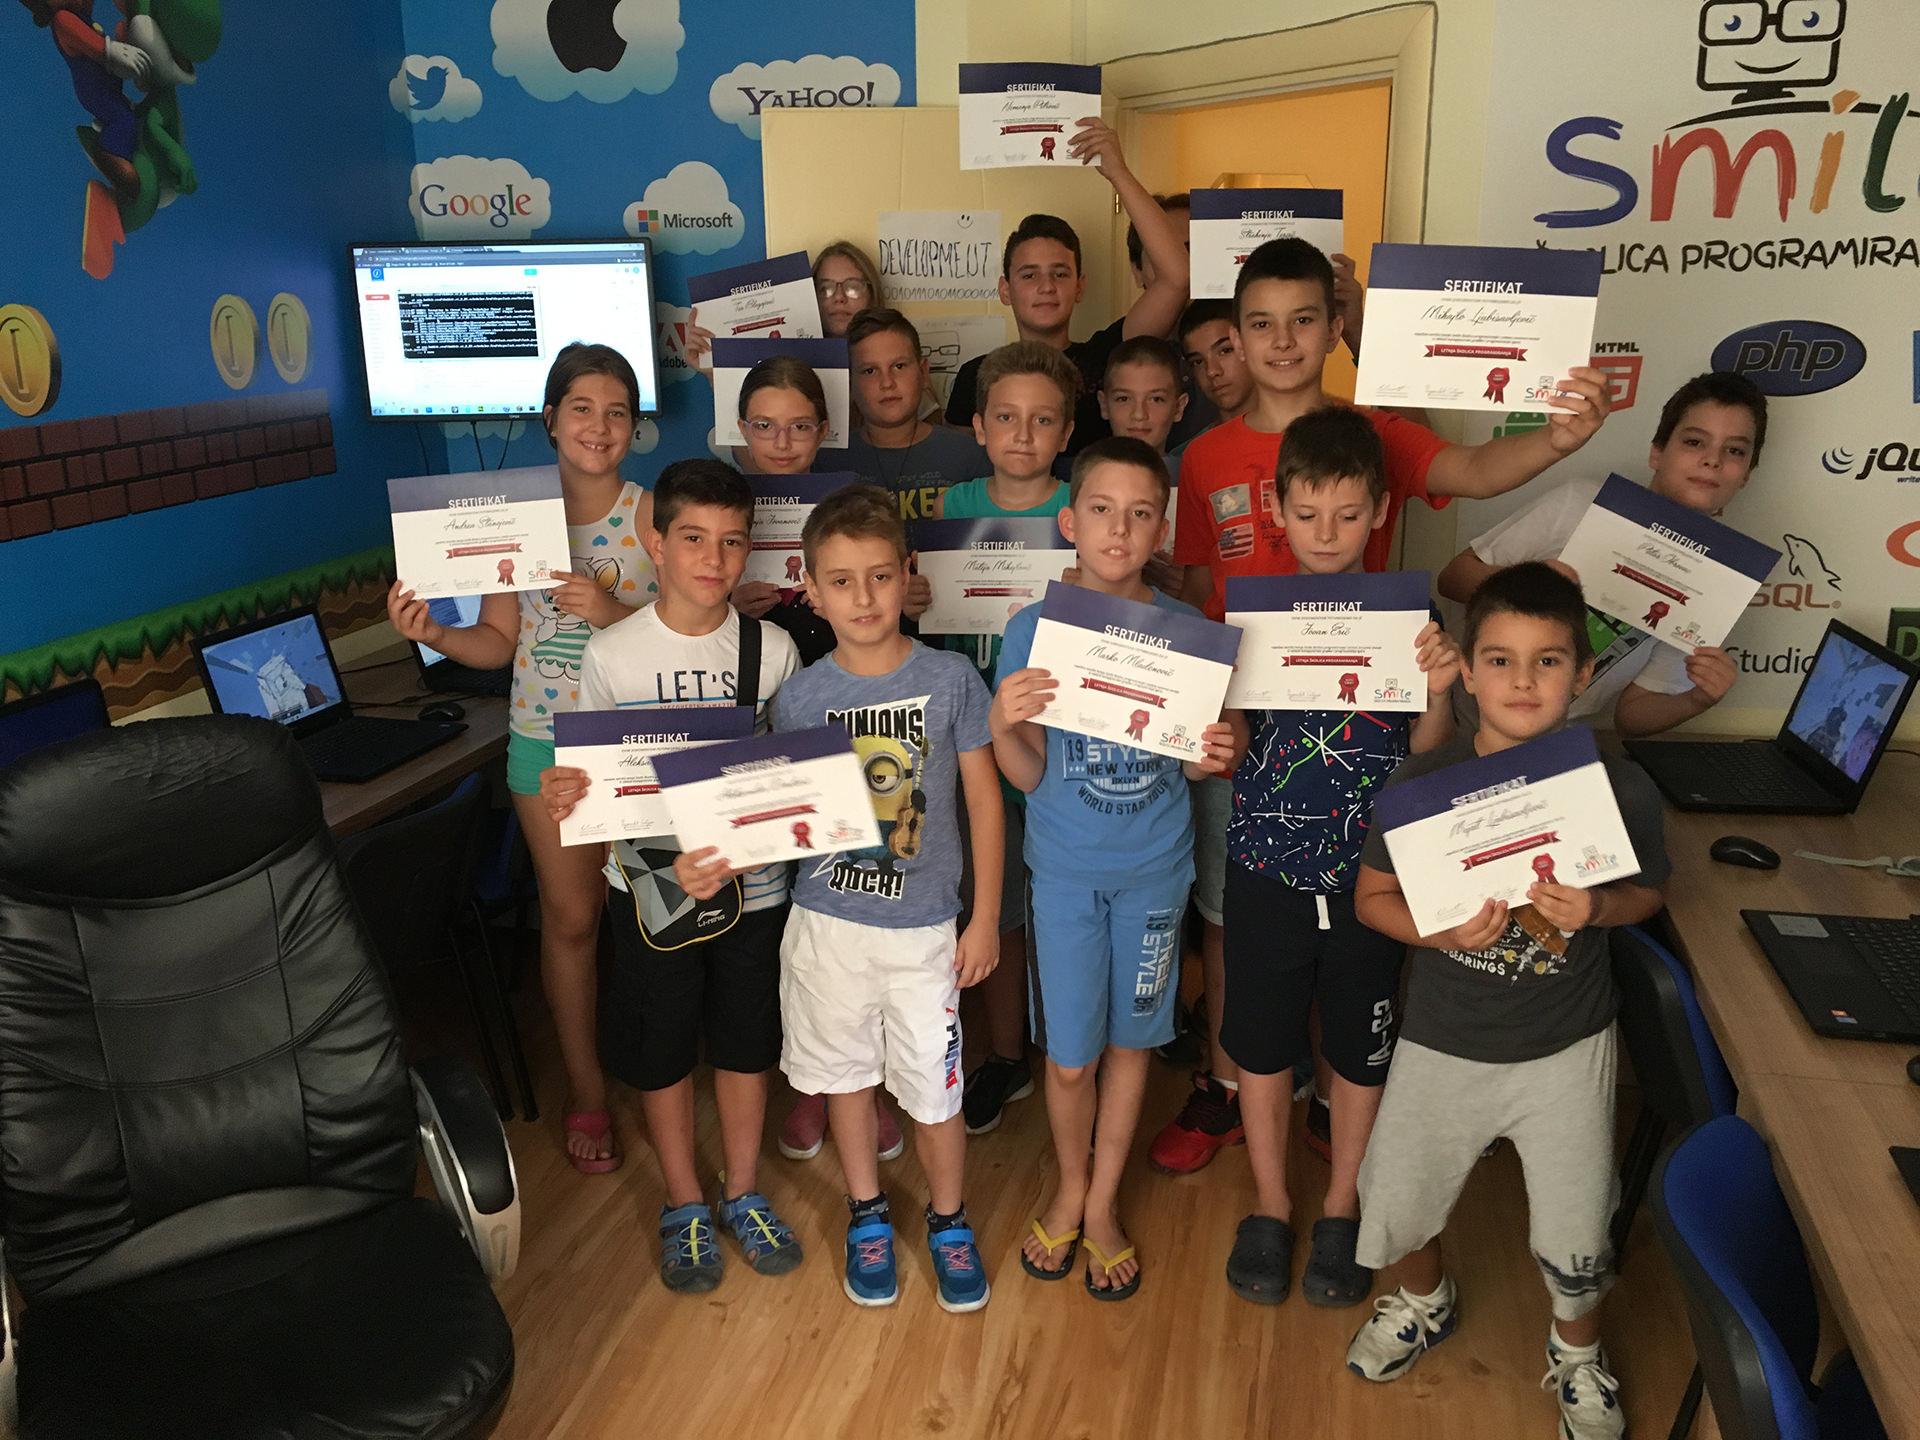 Grupna fotografija polaznika promotivne Smile školice programiranja